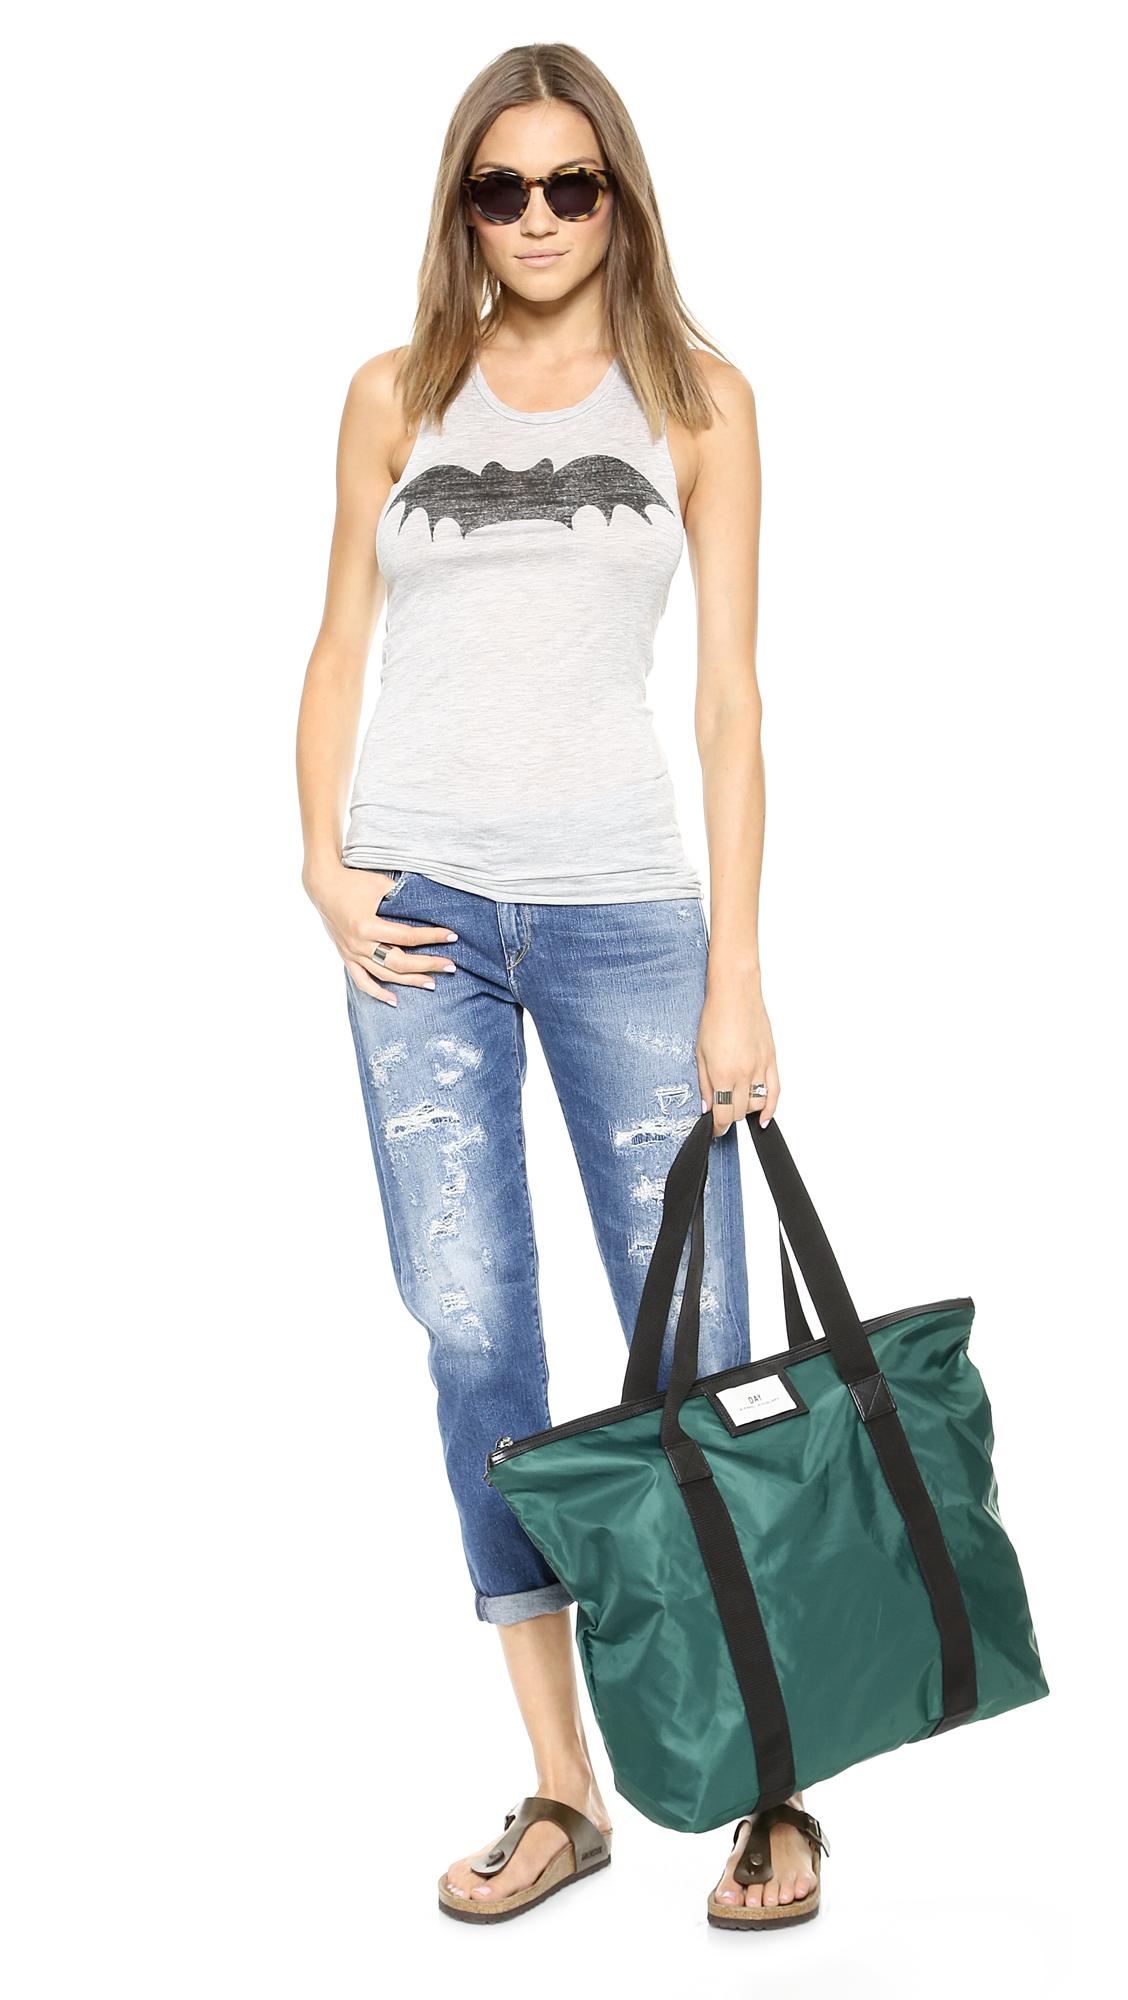 432092cfe Day Birger et Mikkelsen Day Gweneth Tote Bag Emerald in Green - Lyst